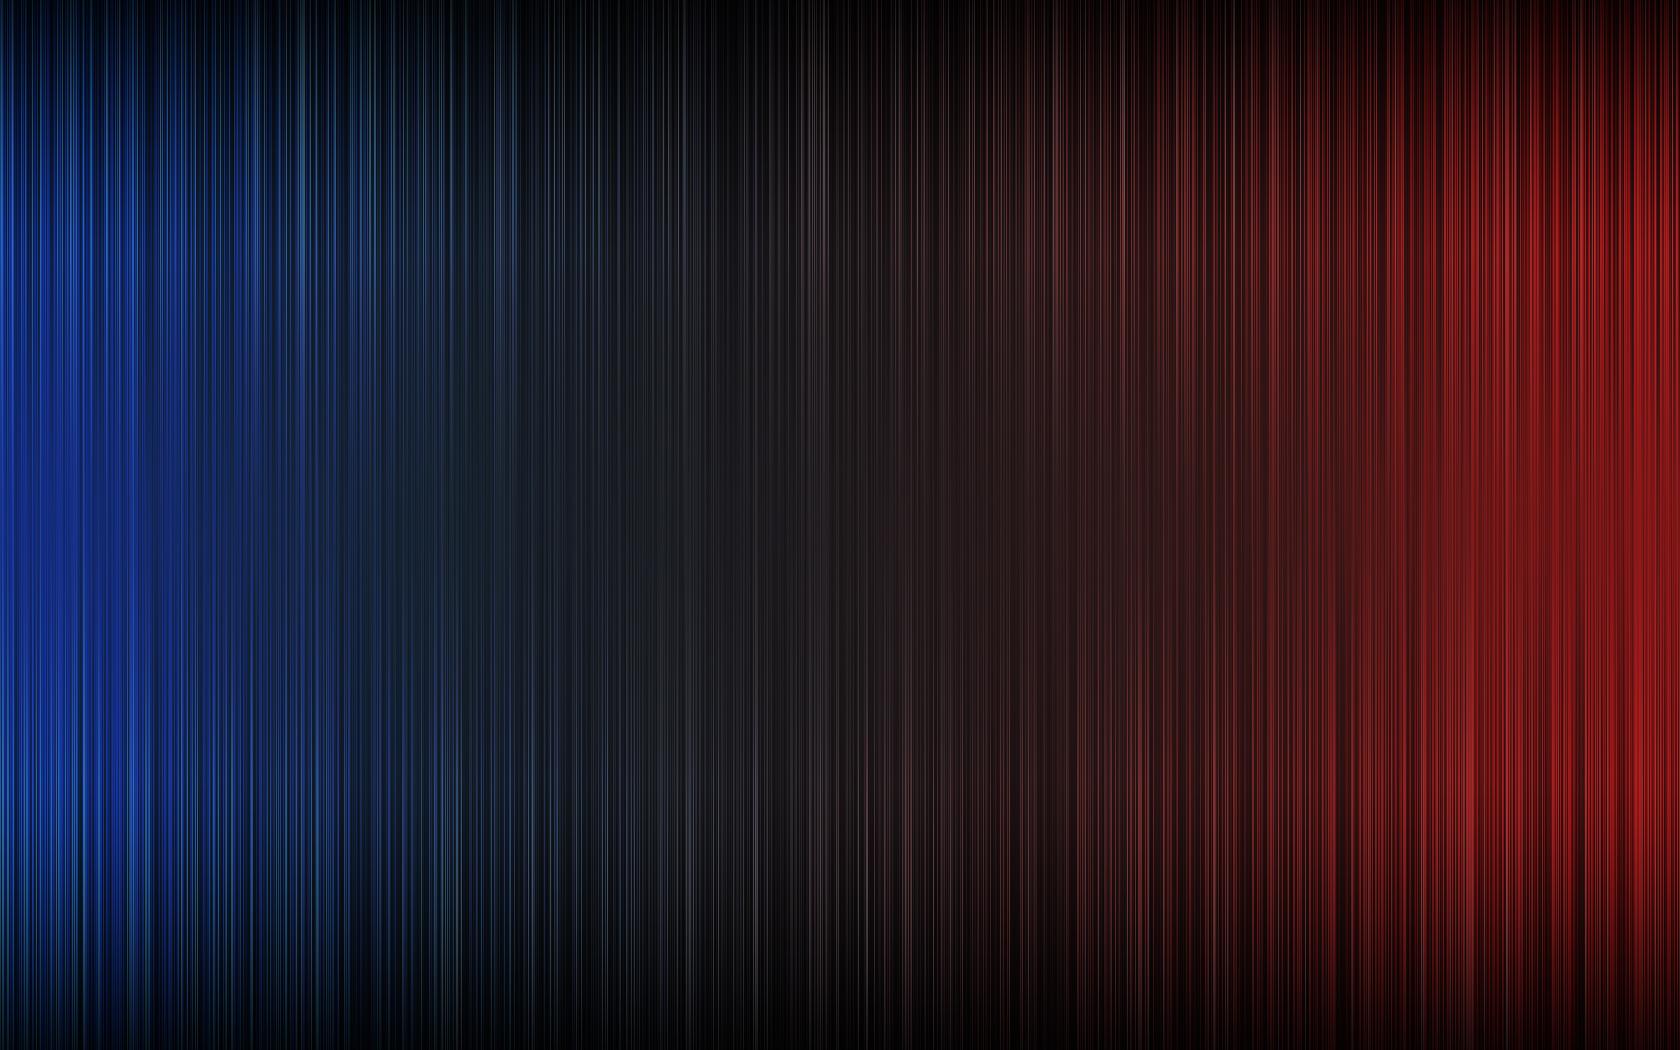 Amazing Motion Blur Wallpaper